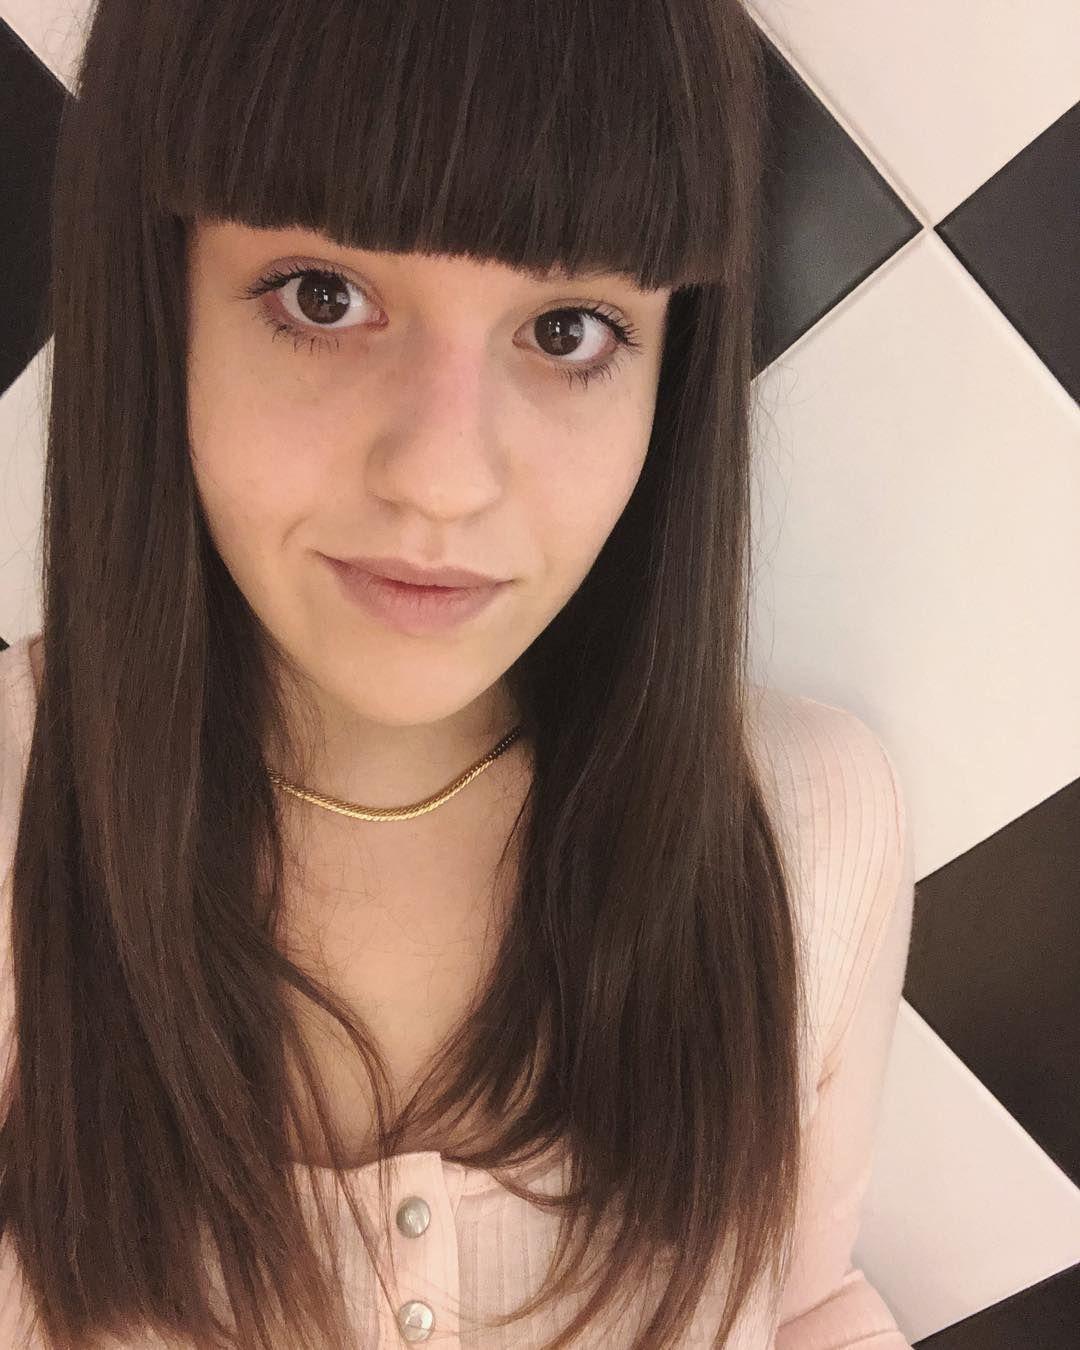 "Gaia on Instagram: ""🐼🖤 #pandagirl #girl #sexy #paleskin #brunette #smartgirl #italiansdoitbetter #nerdgirl #italiangirl #inkedgirls #occhioni #cerbiatta…"""